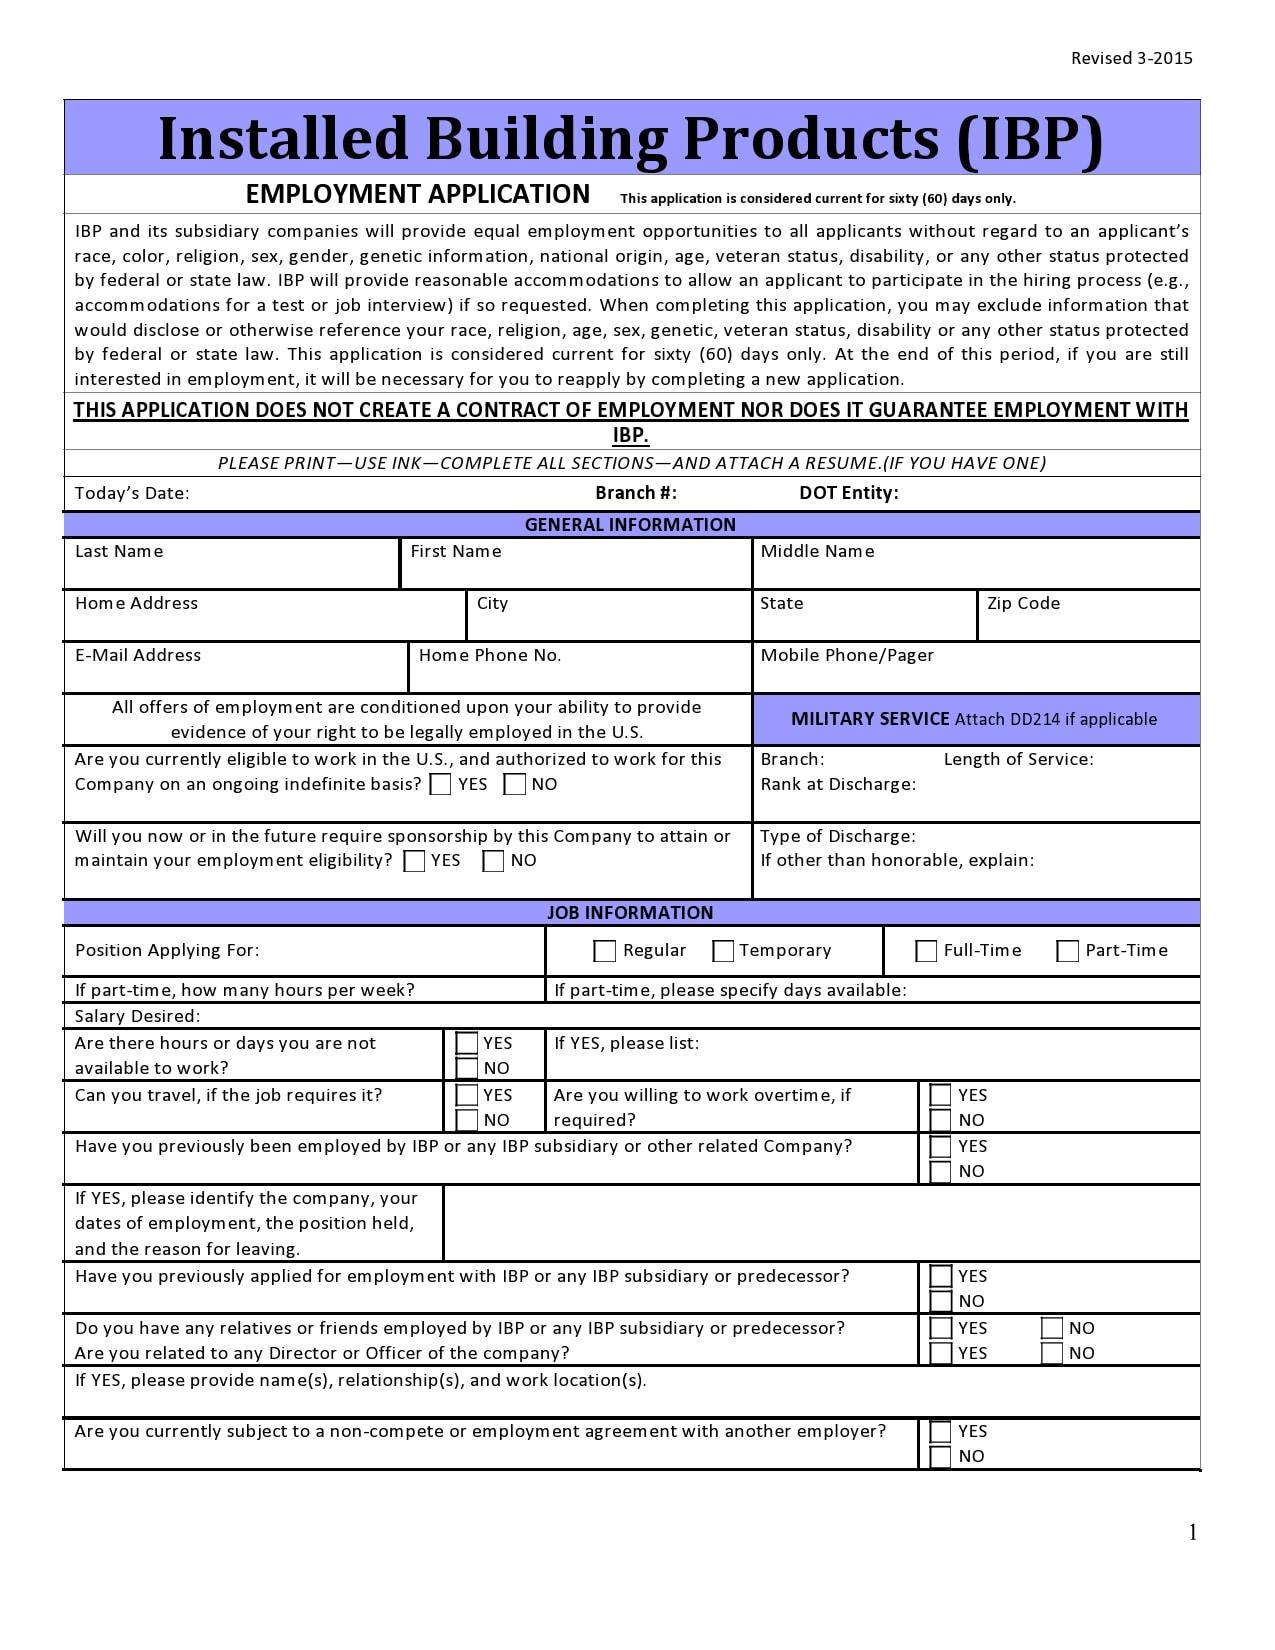 employment application template 26